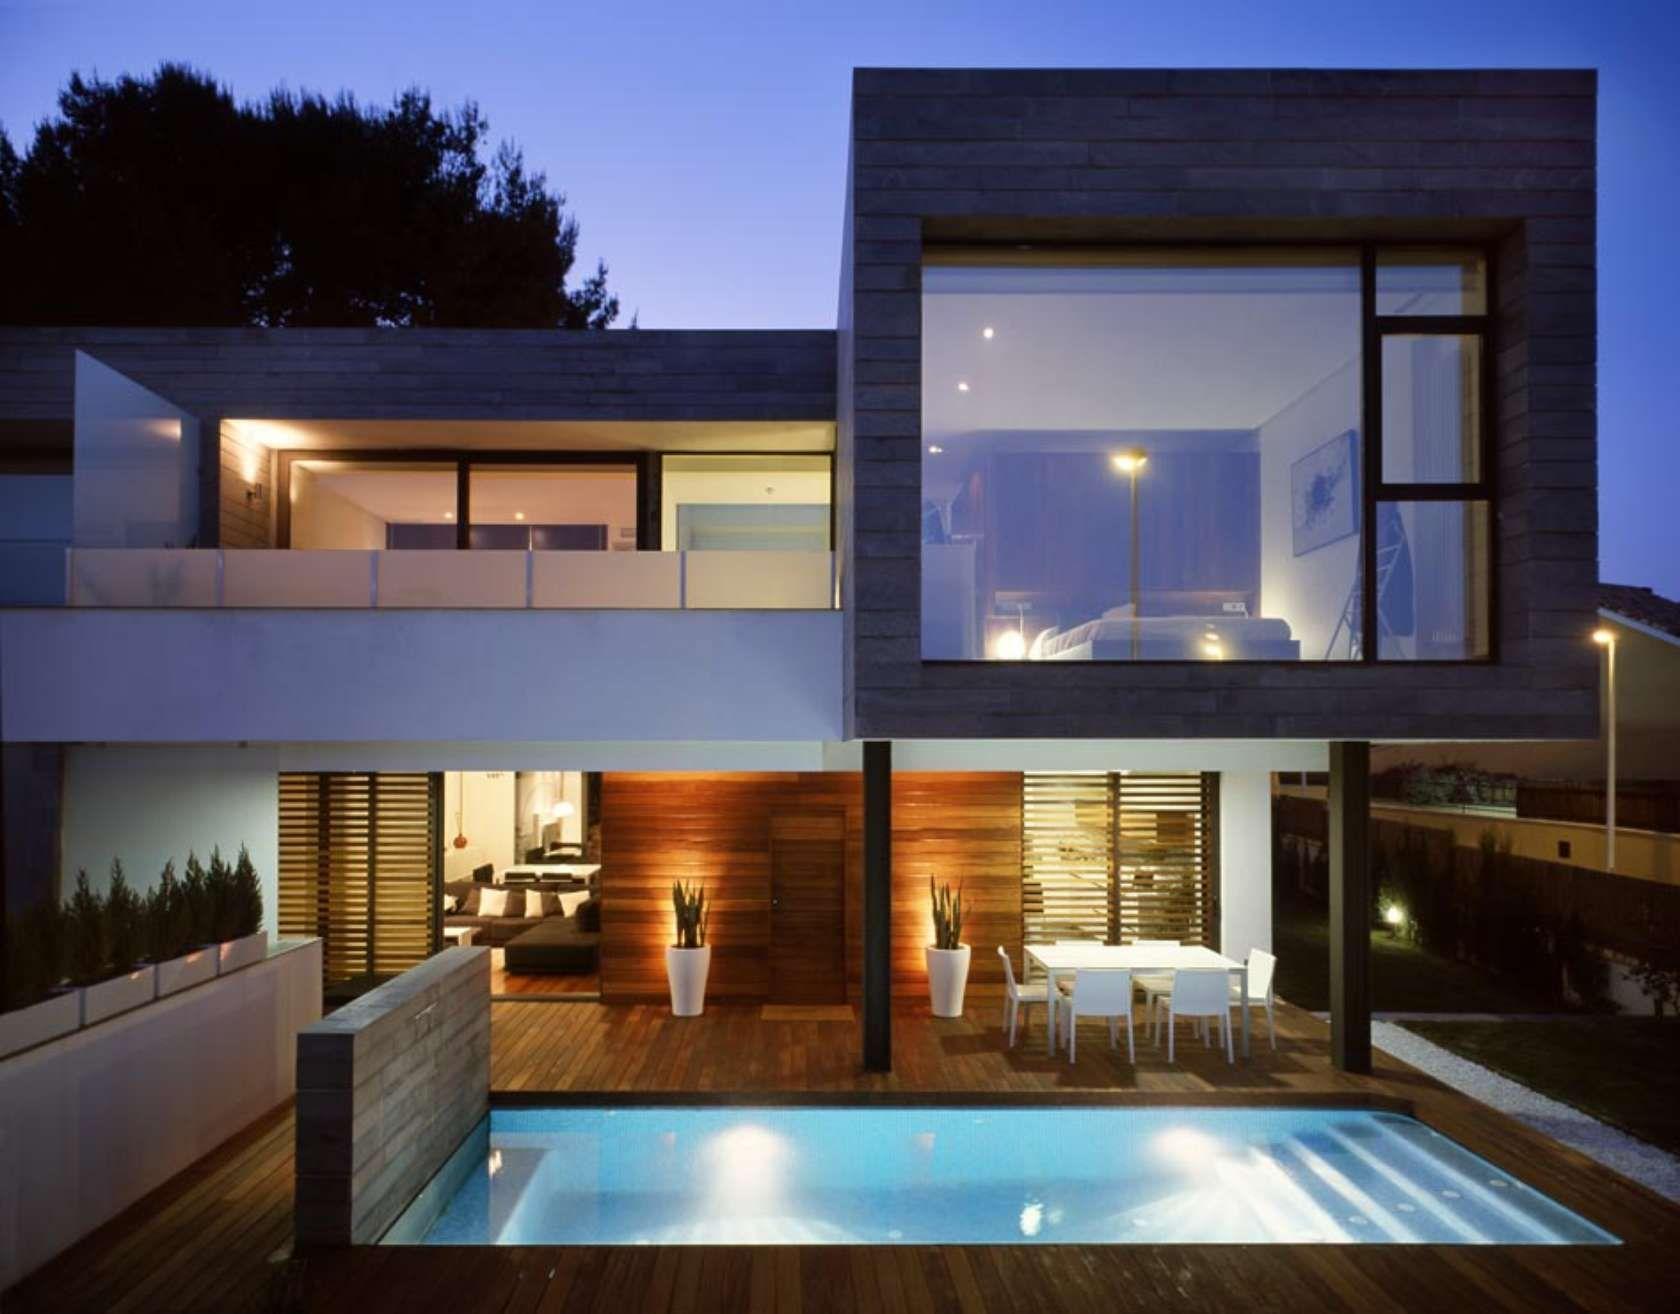 7 viviendas unifamaliares rocafort   ARQ. RESIDENCIAL   Pinterest ...